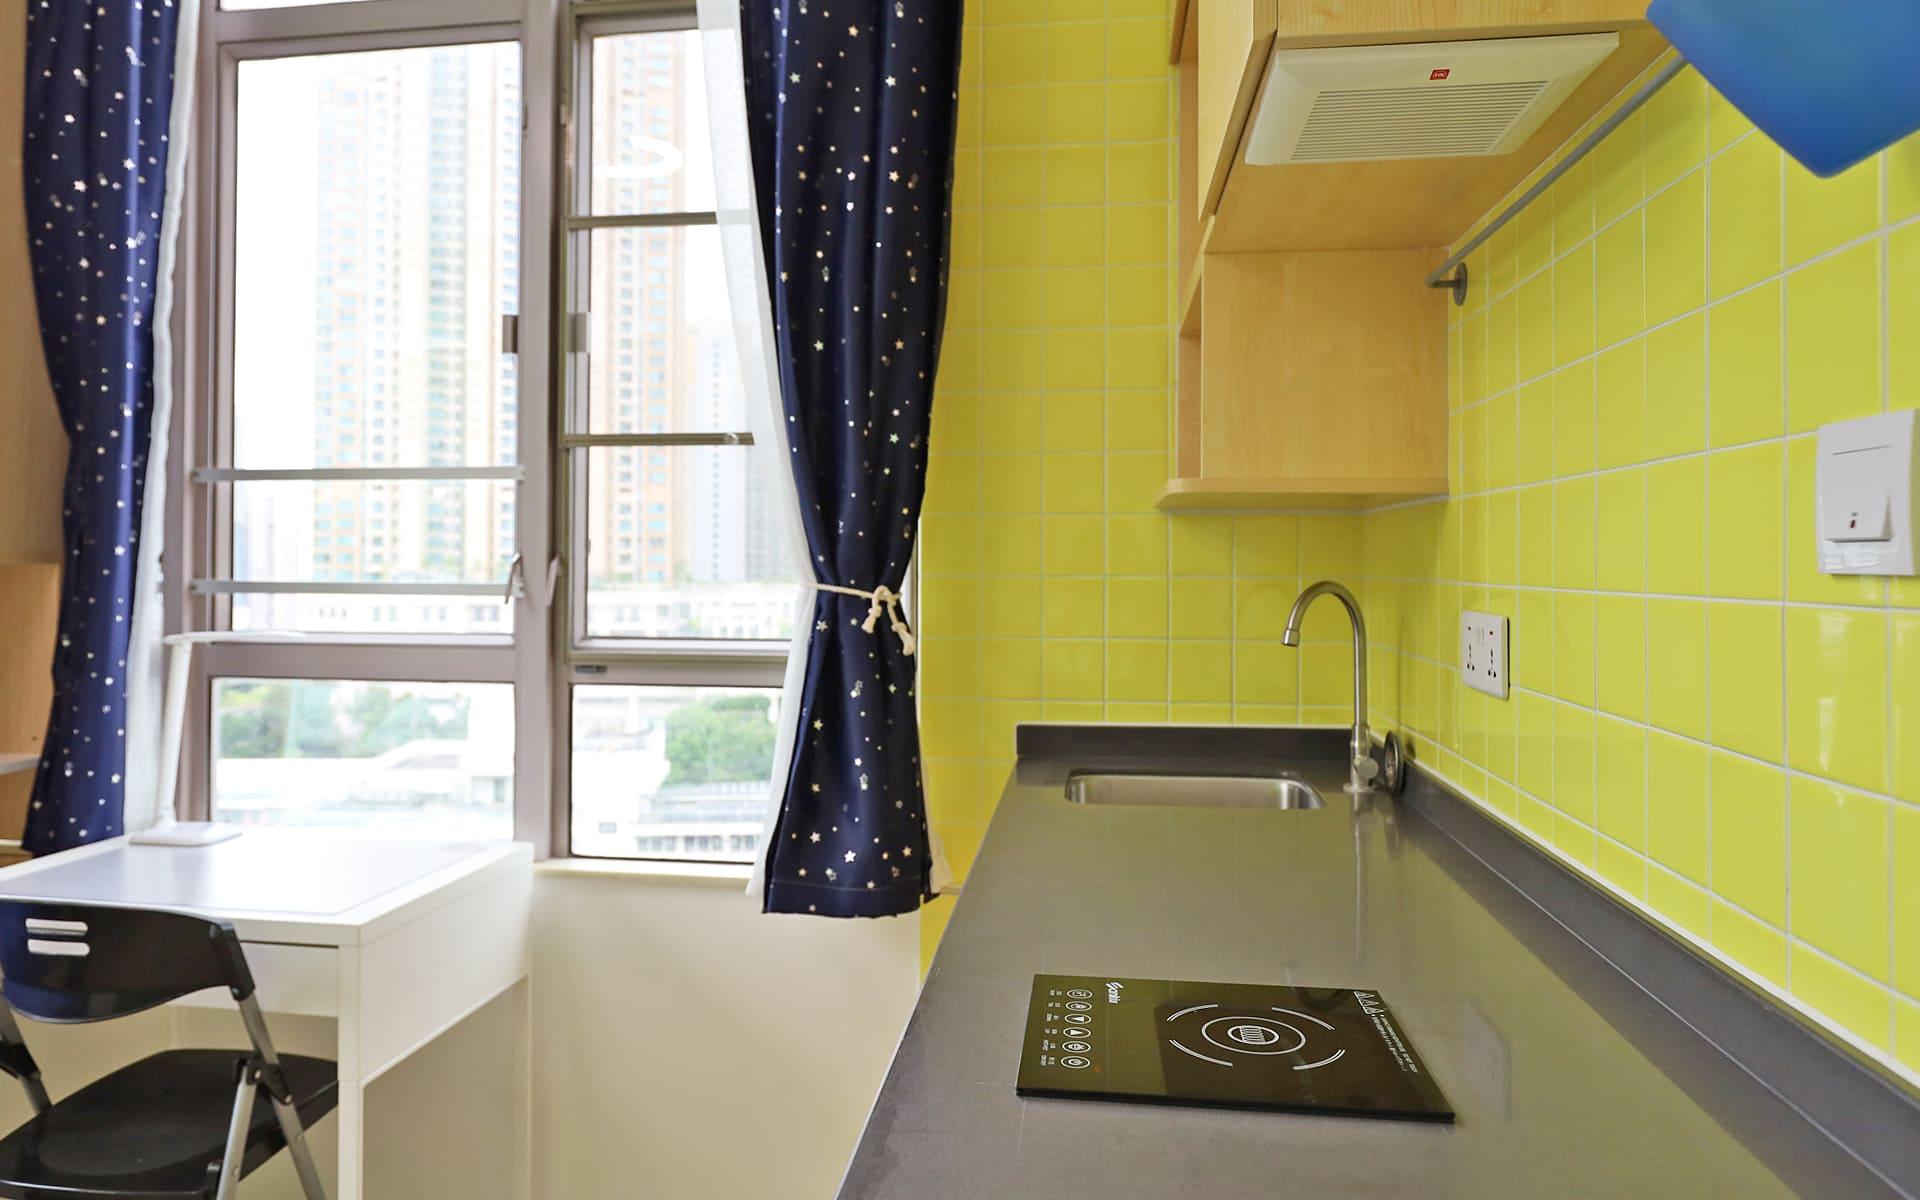 hk_service_apartment_4091591901596691912.jpg